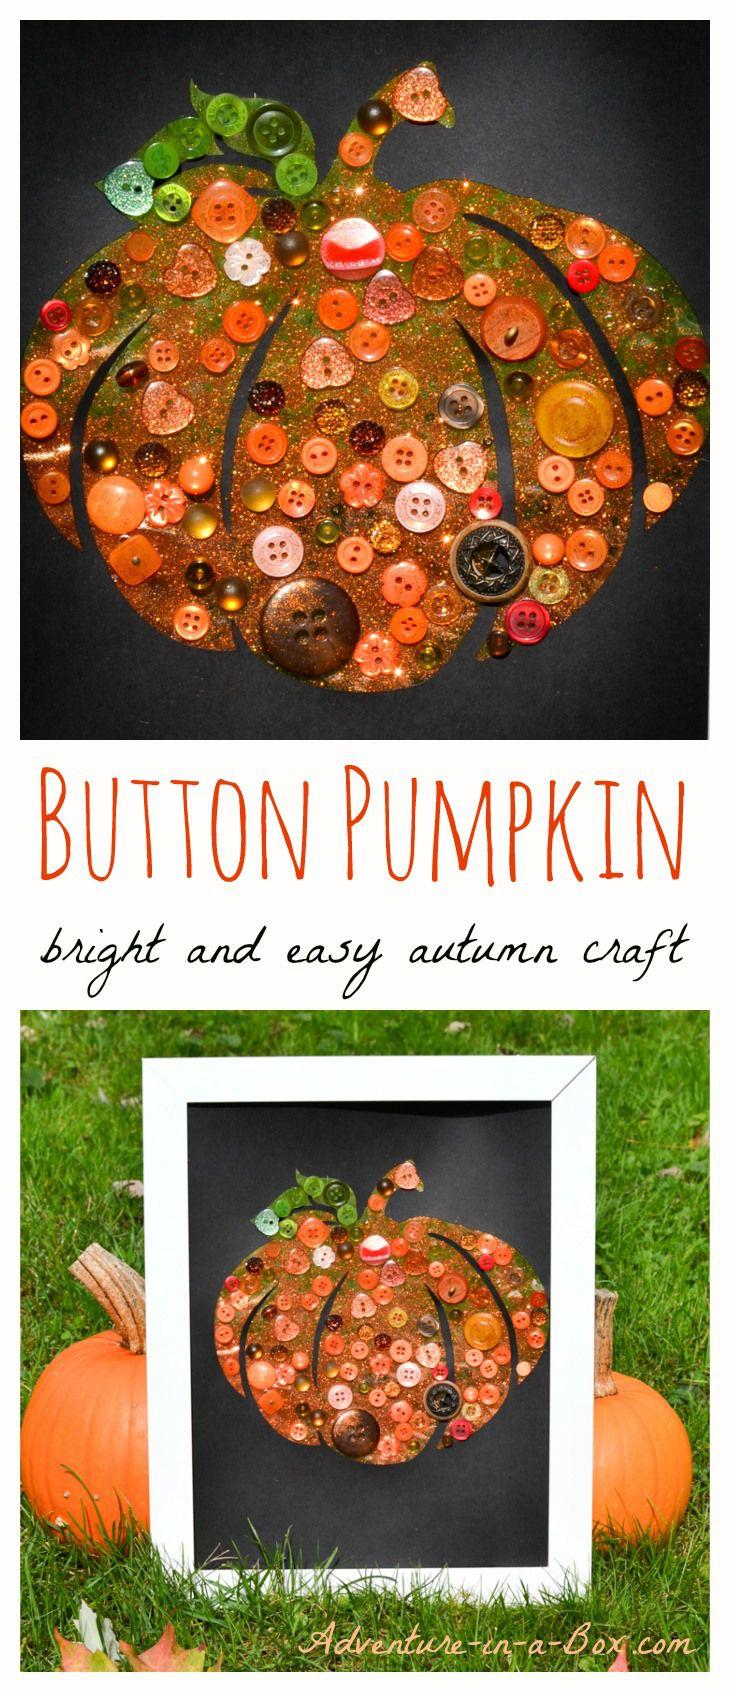 Button-Pumpkin-Autumn-Craft-for-Children.jpg 730×1,692 pixels